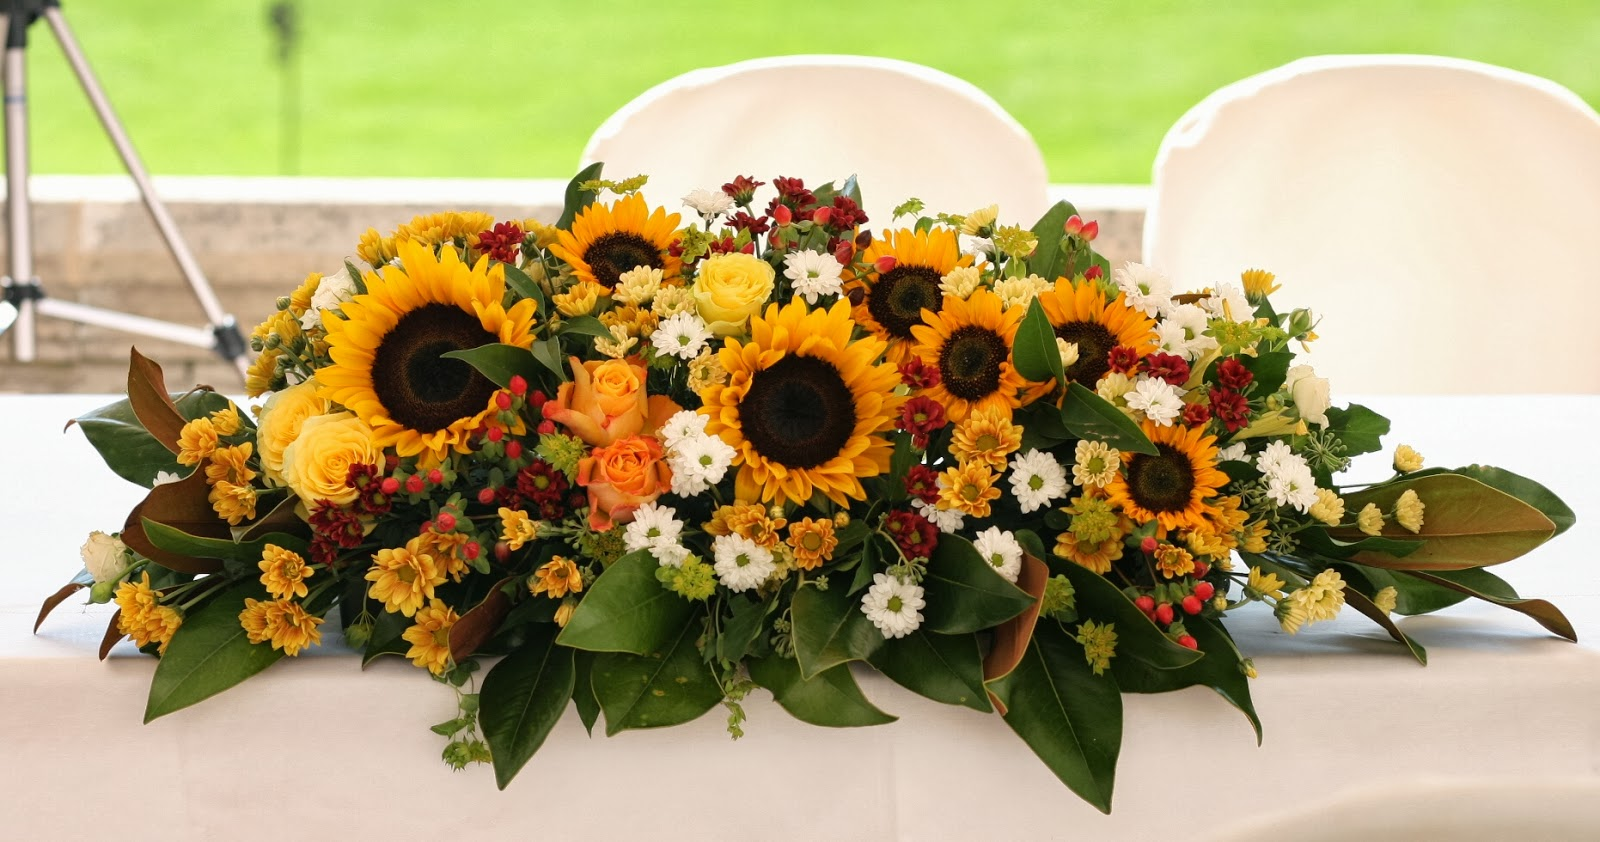 Tavoli Matrimonio Girasoli : Green grass un matrimonio estivo girasoli e sorrisi